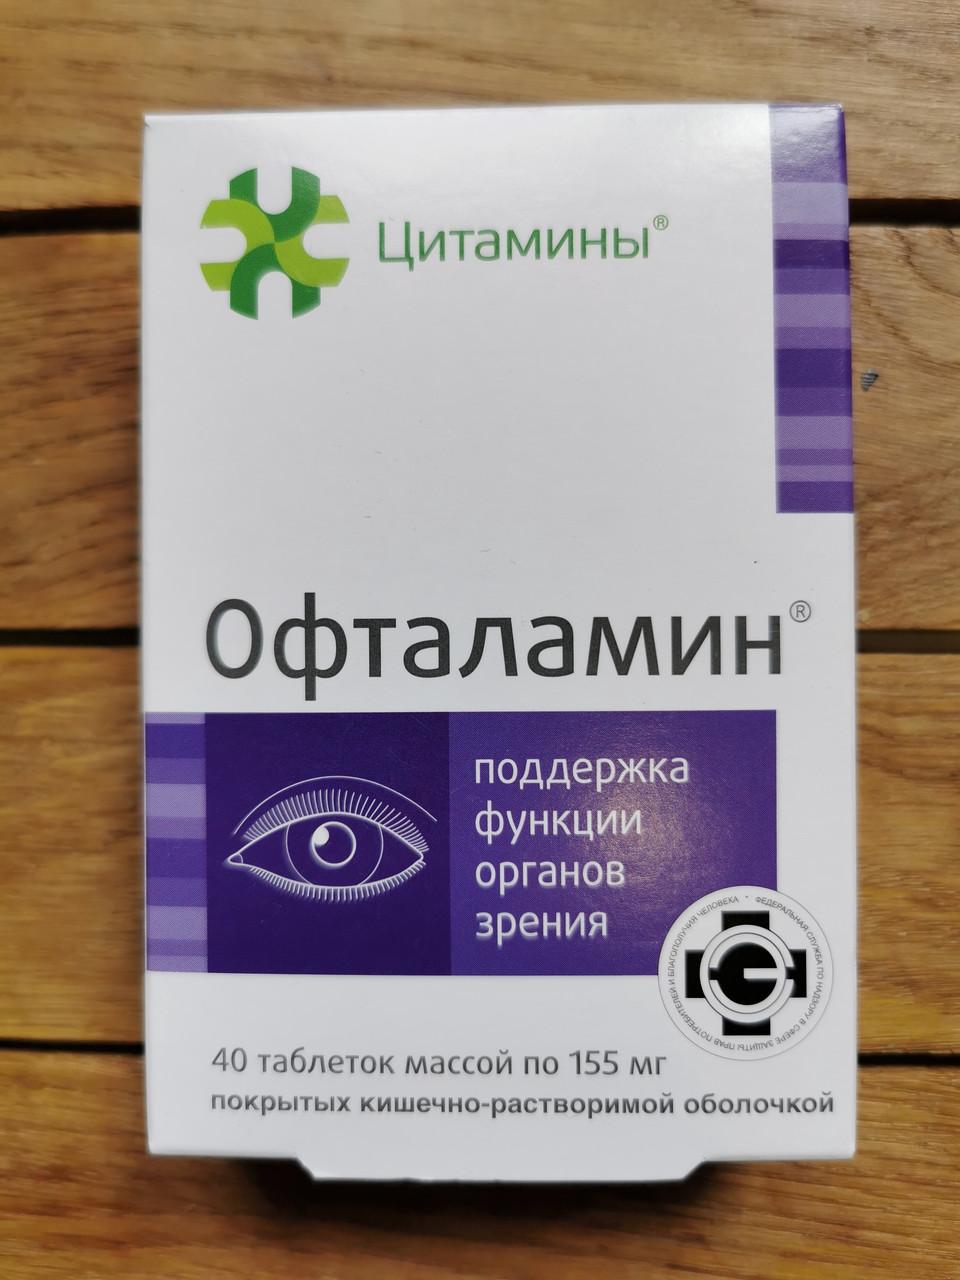 Гепатамин, 40 таб., Цитамины